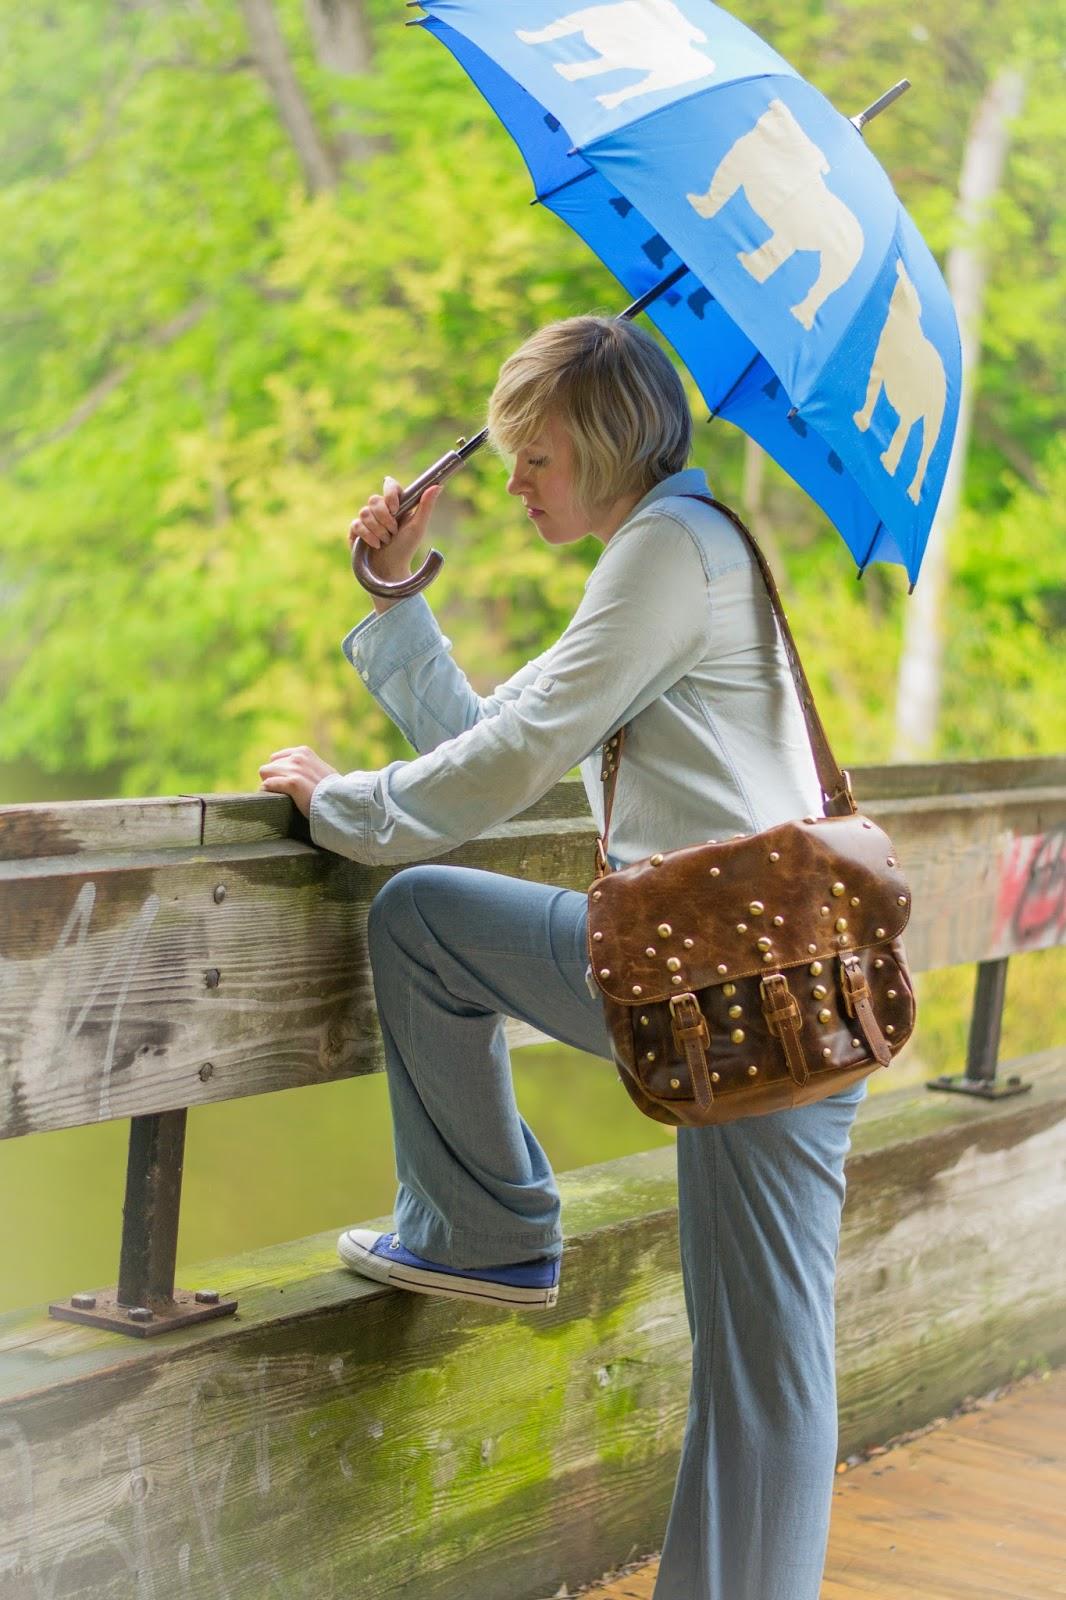 summer rain outfit